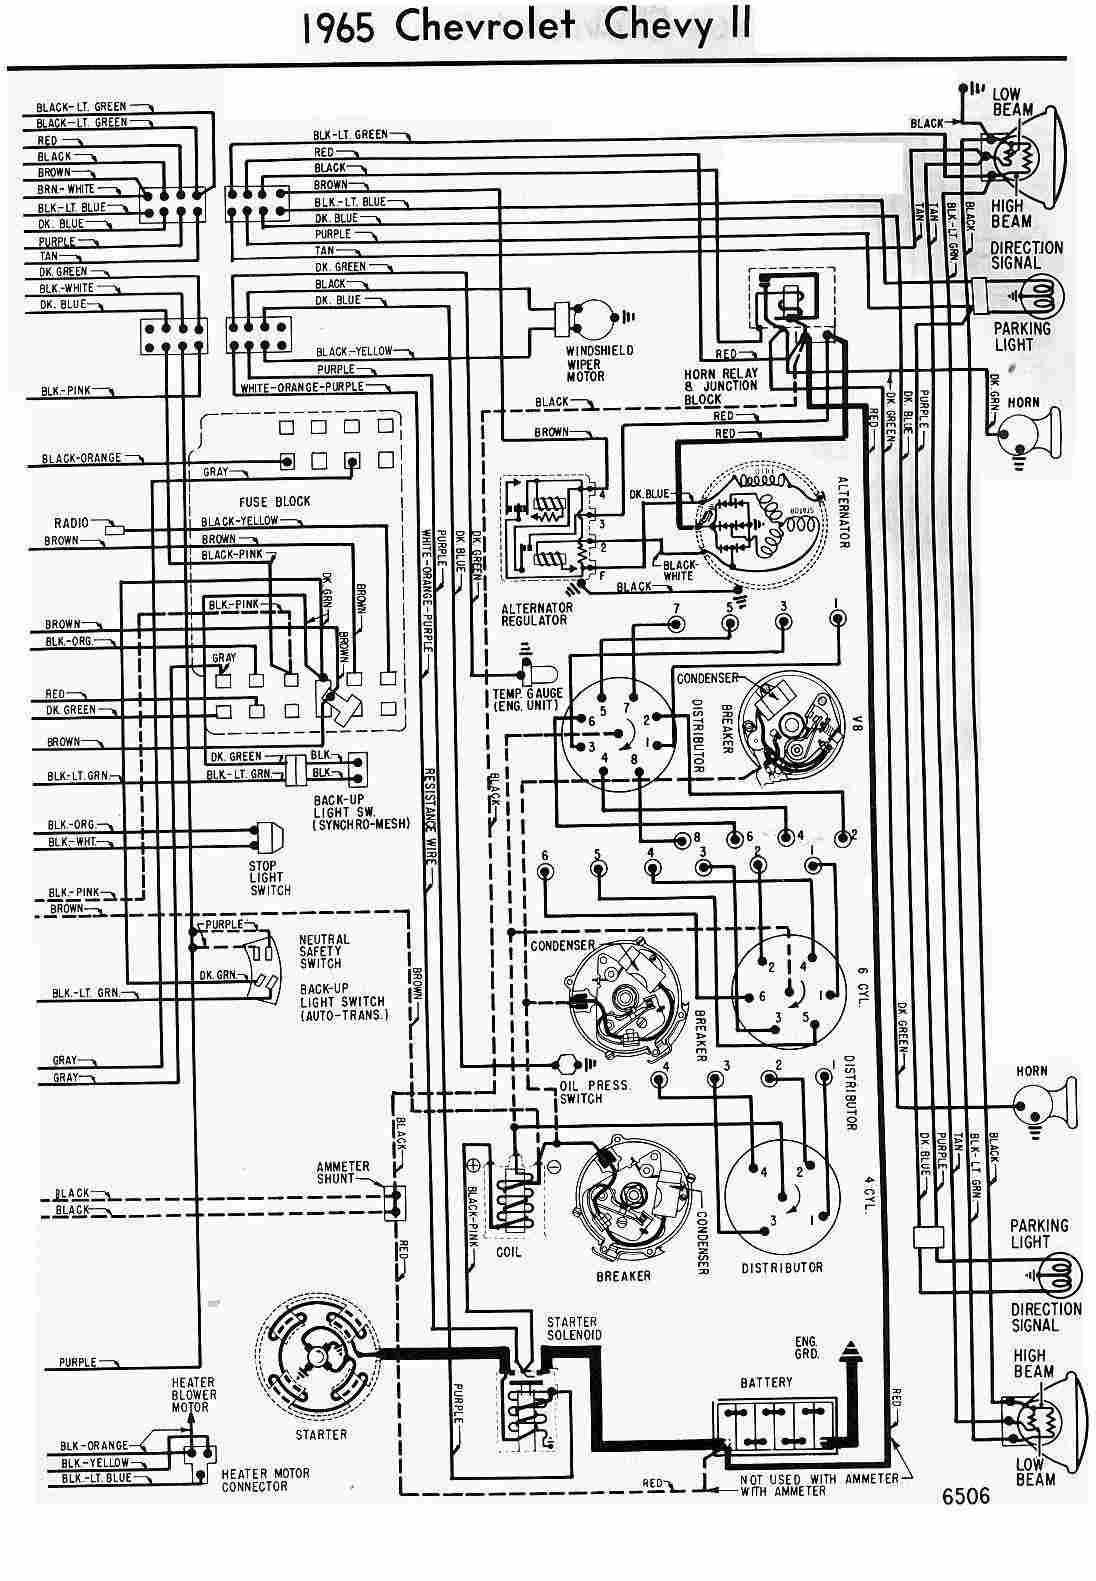 2011 chevy aveo ignition wiring diagram: w wiring impala diagrams - wiring  diagrams schematicsrh: